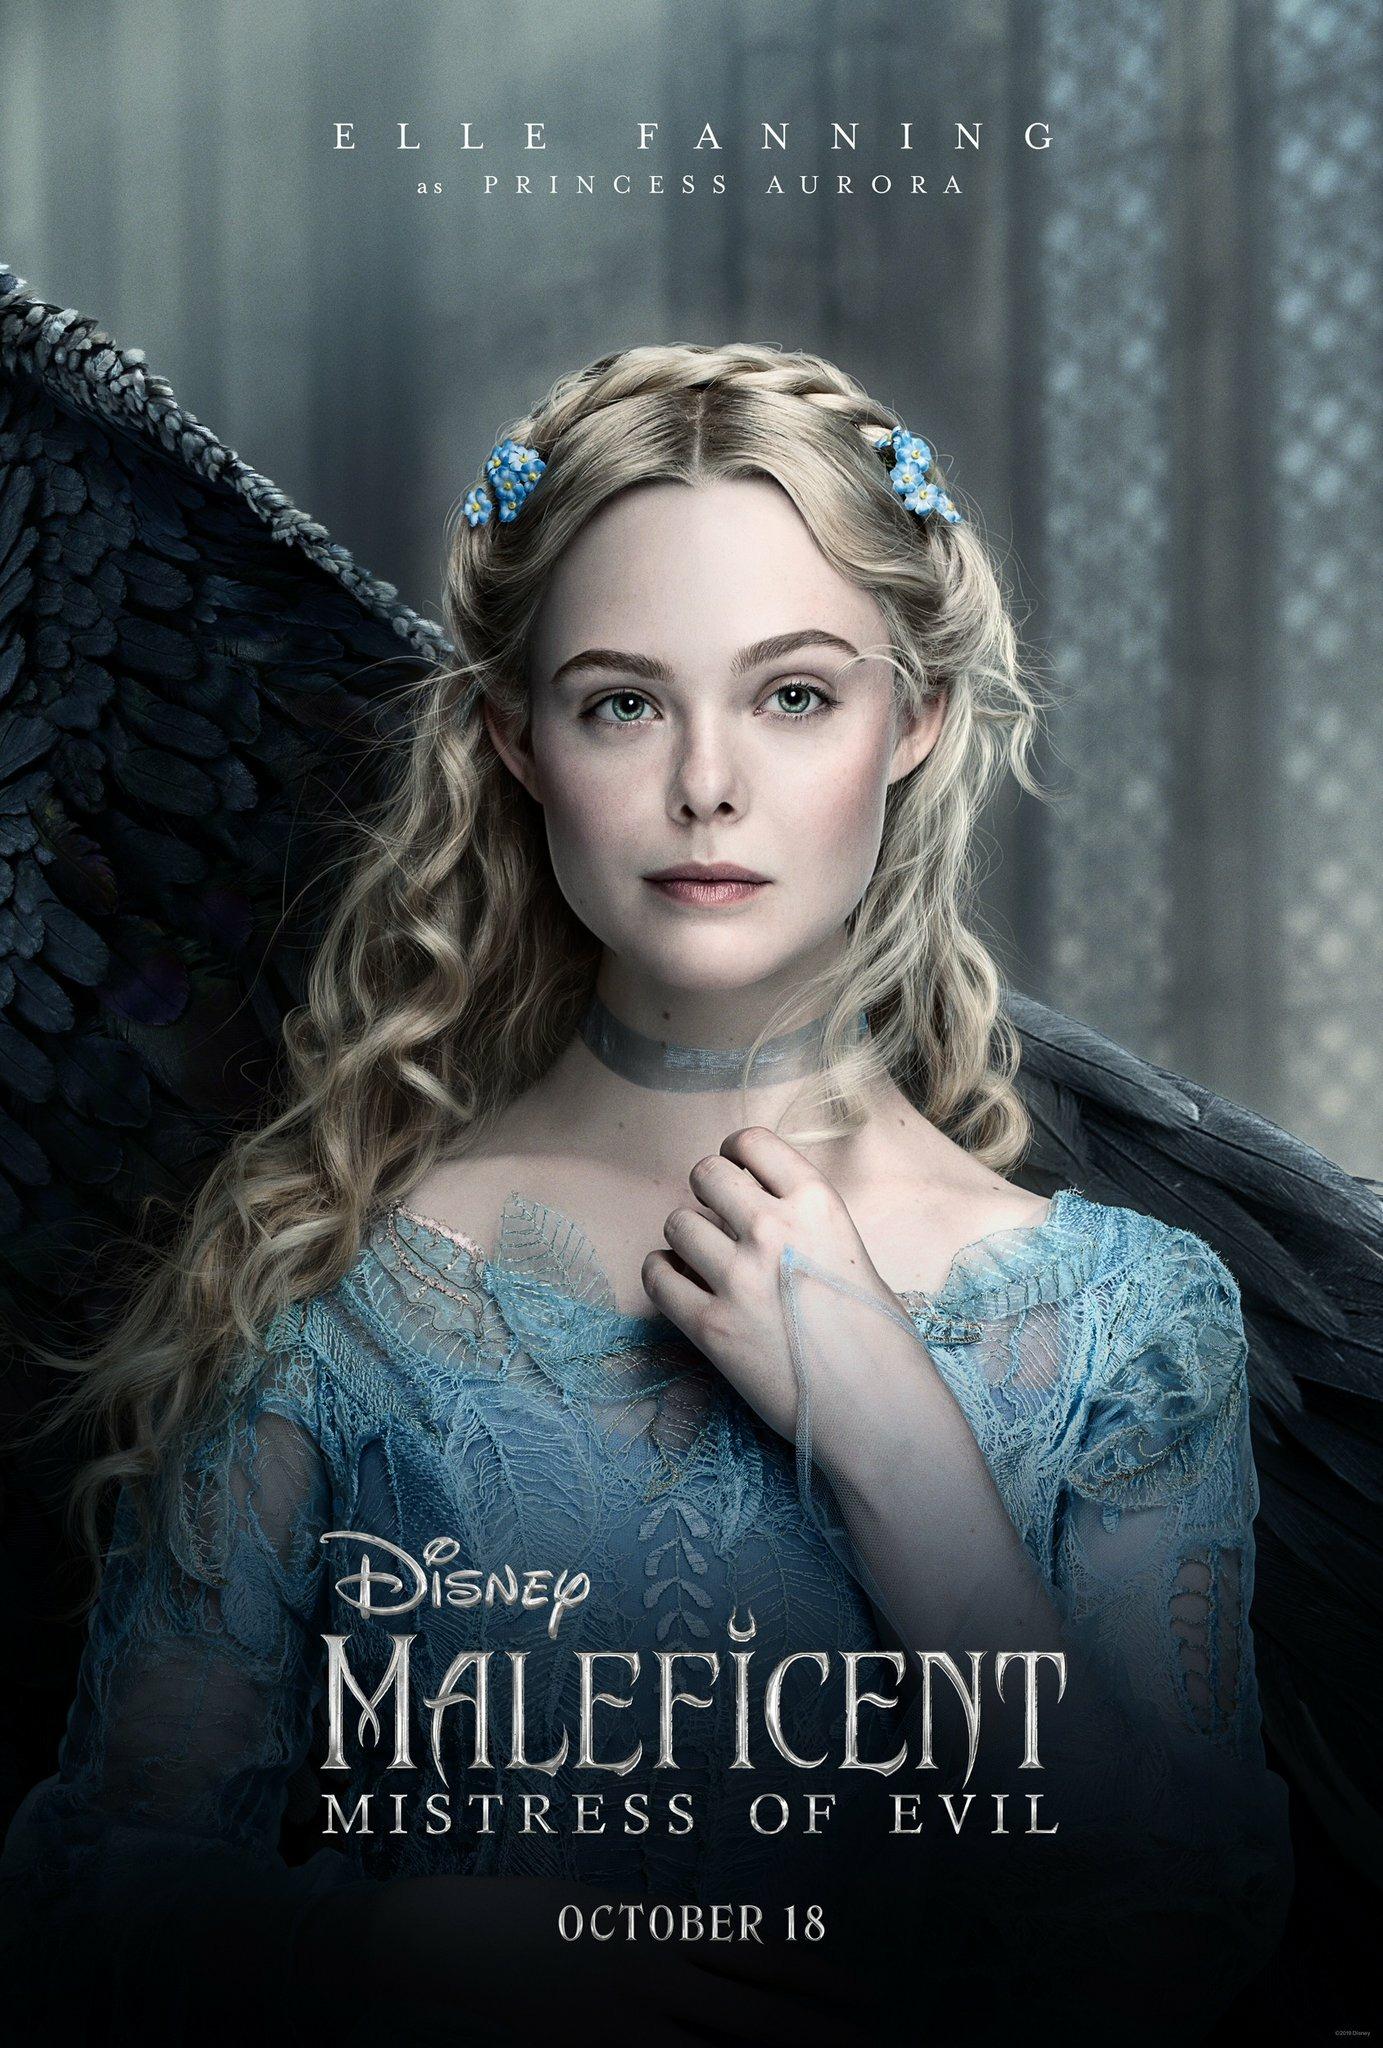 szmk_maleficent_mistress_of_evil_demona_disney_csipkerozsika_angelina_jolie_sotetseg_urnoje_2_11.jpg